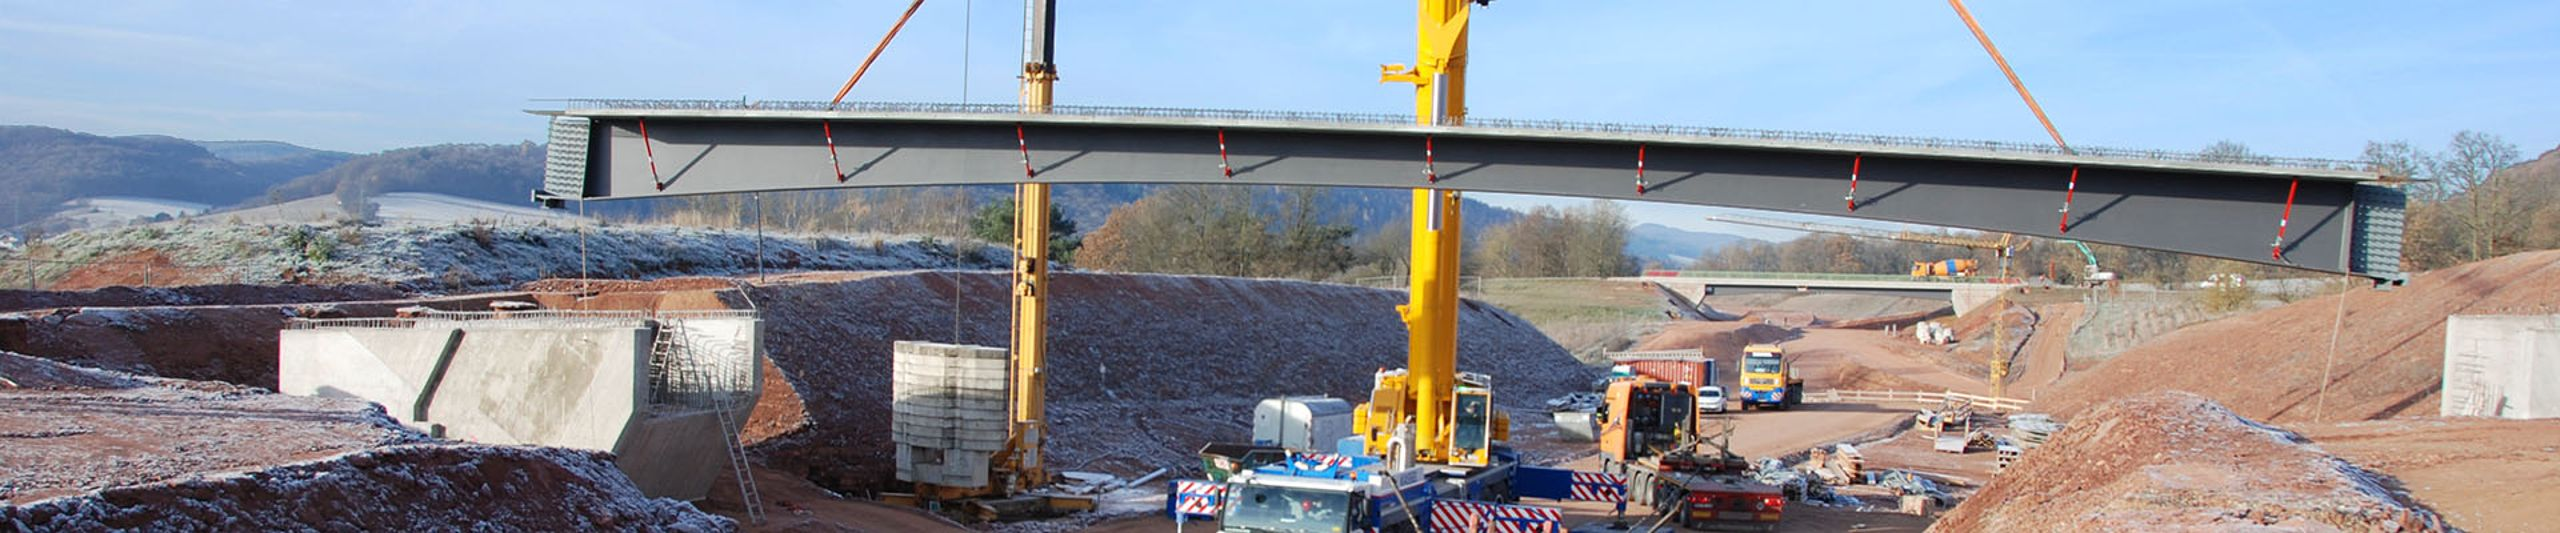 Prefabricated bridge components and concrete bridge girders